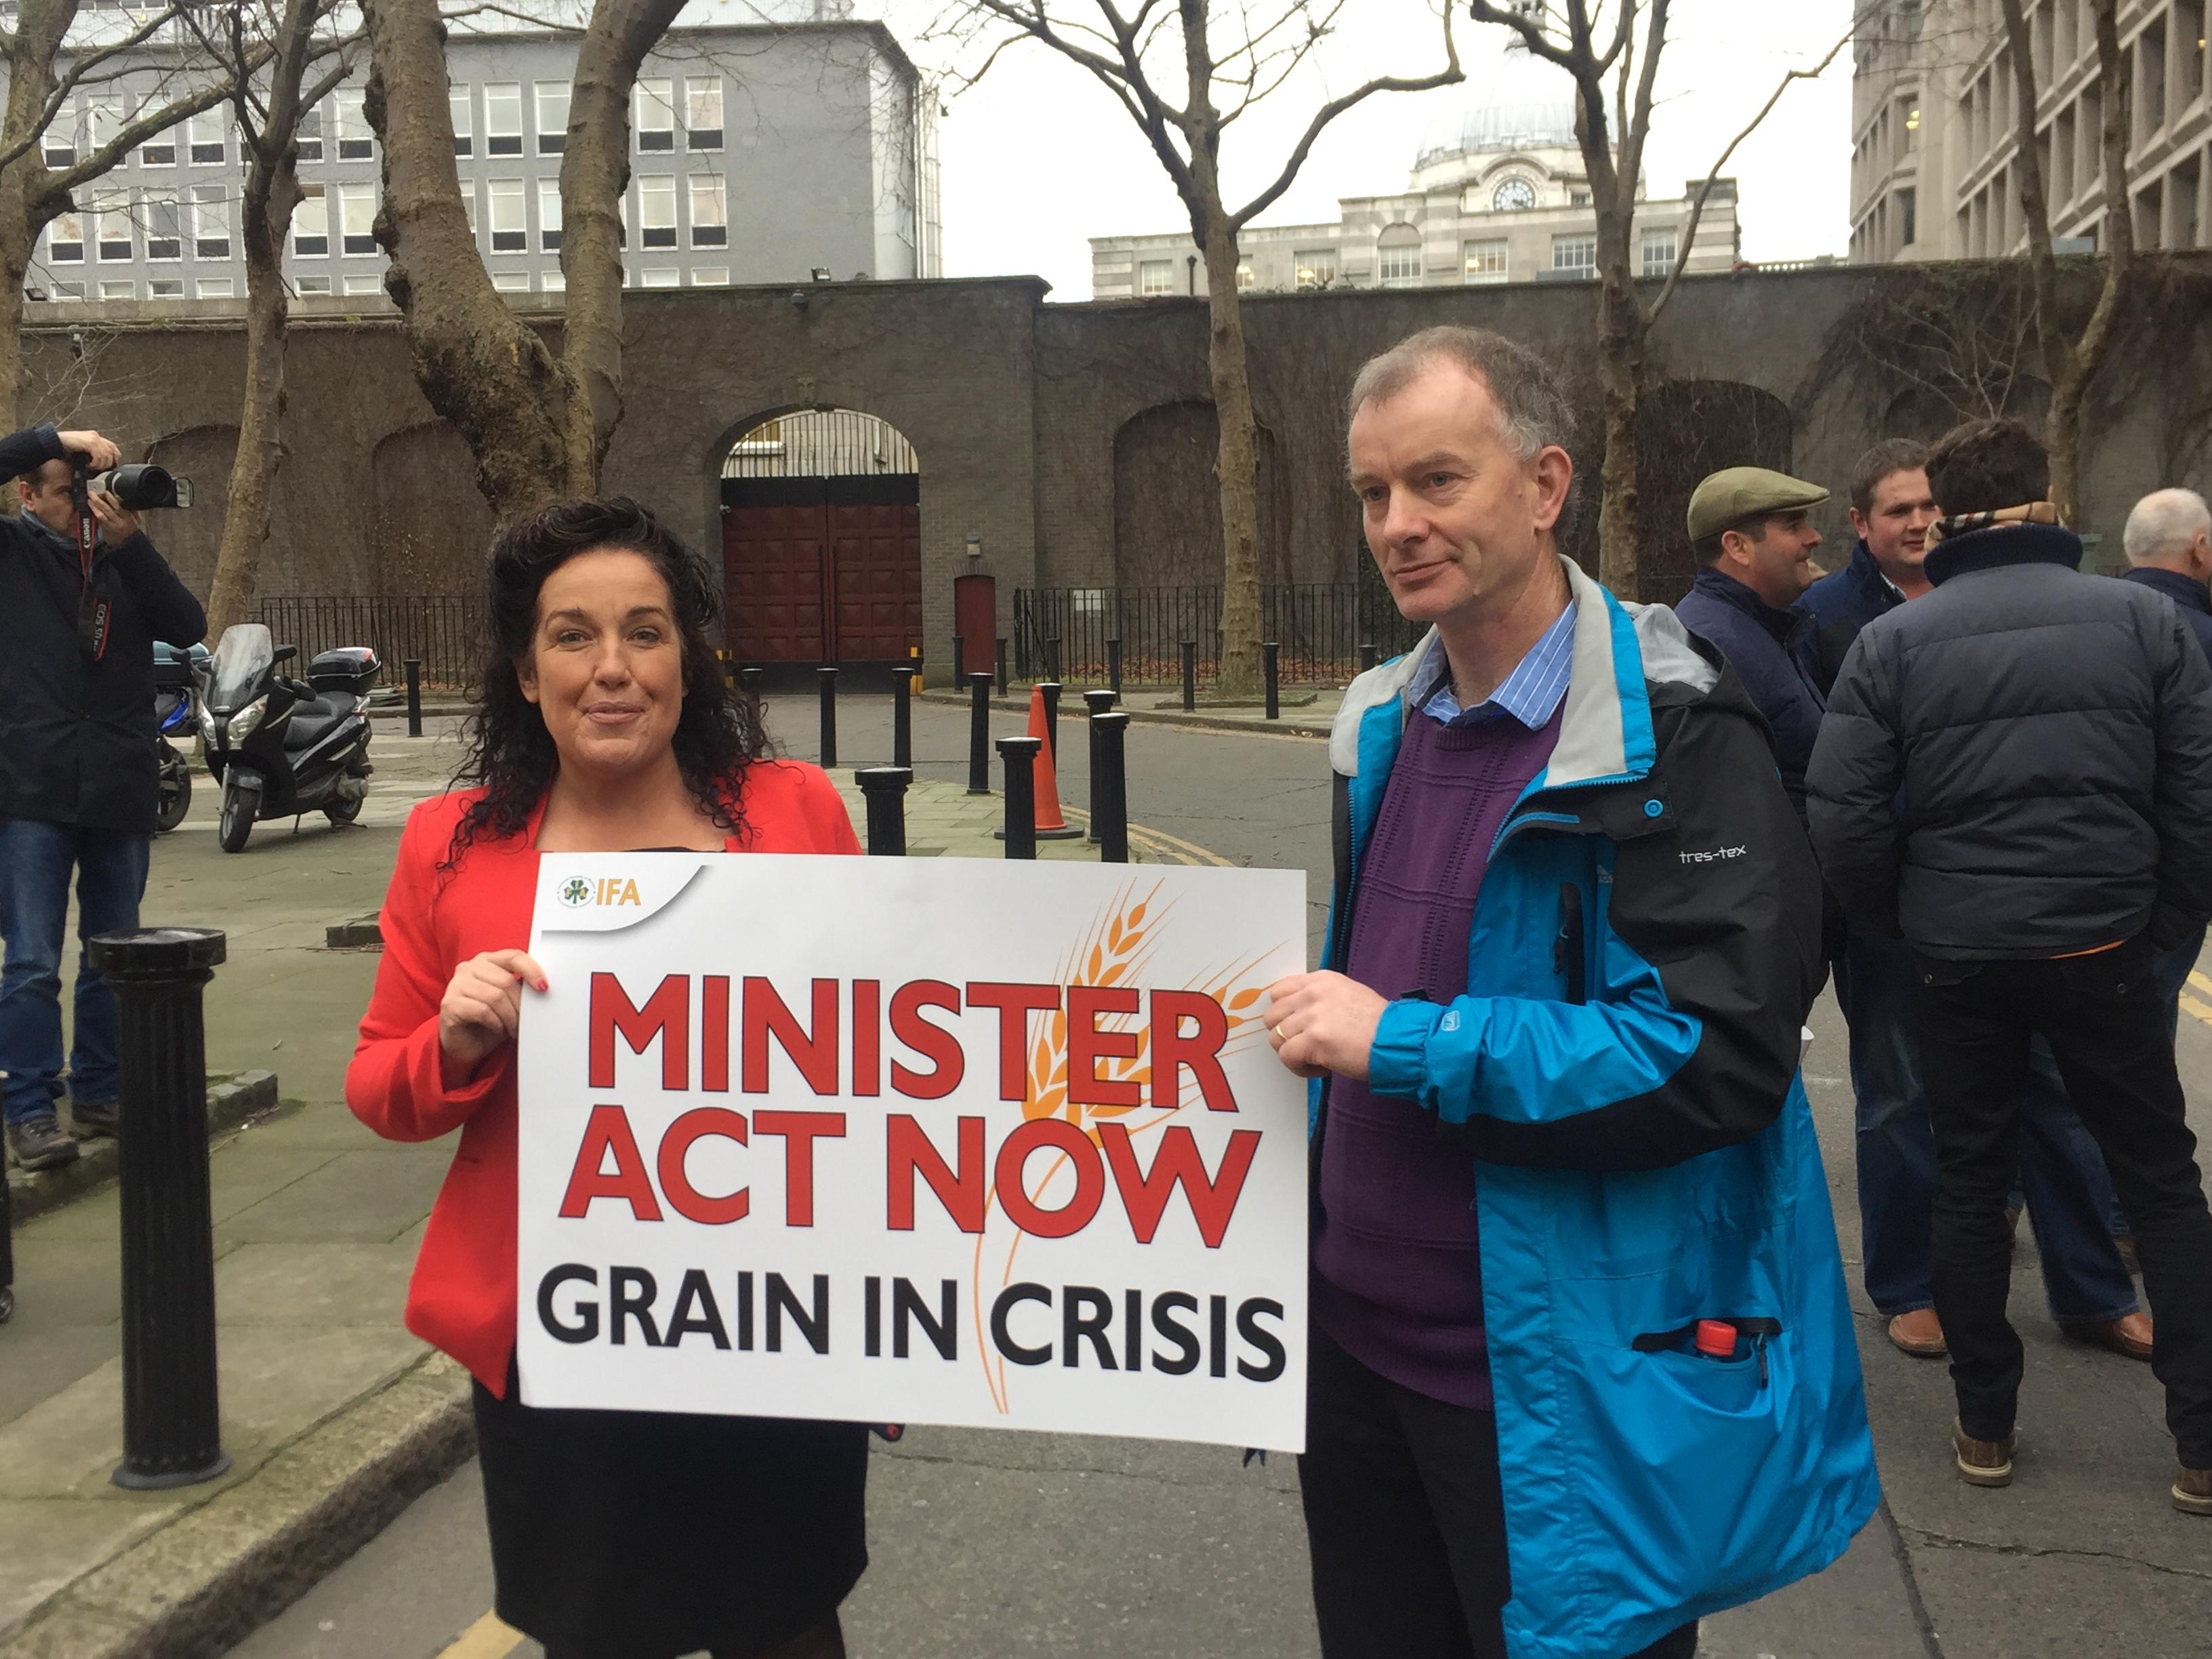 Cork South West TD, Margaret Murphy O'Mahony joins Cork Tillage Farmers protesting outside Dáil Éireann